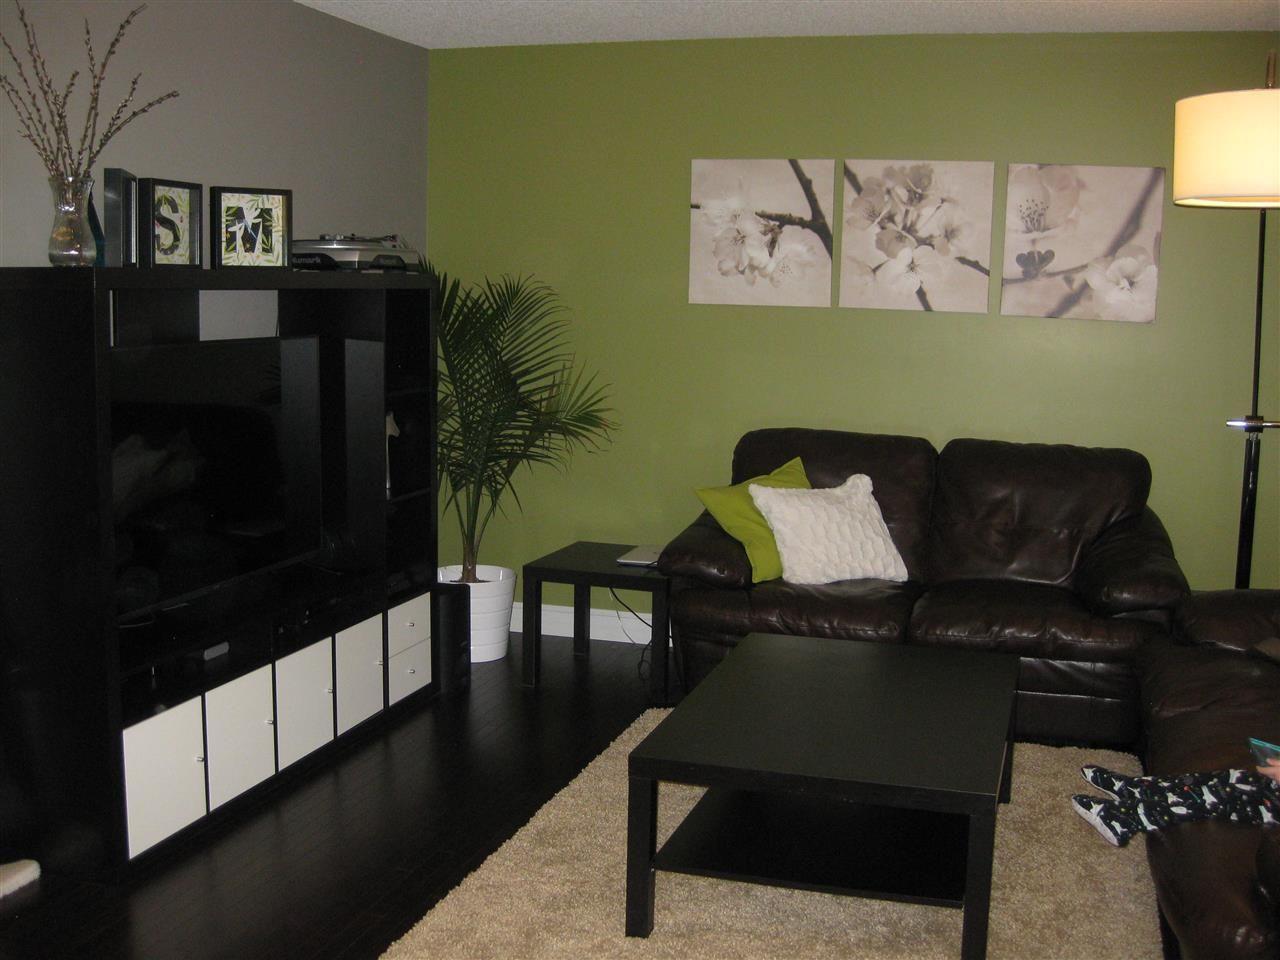 Photo 7: Photos: #41 3625 144 AV NW in Edmonton: Zone 35 Townhouse for sale : MLS®# E4016087